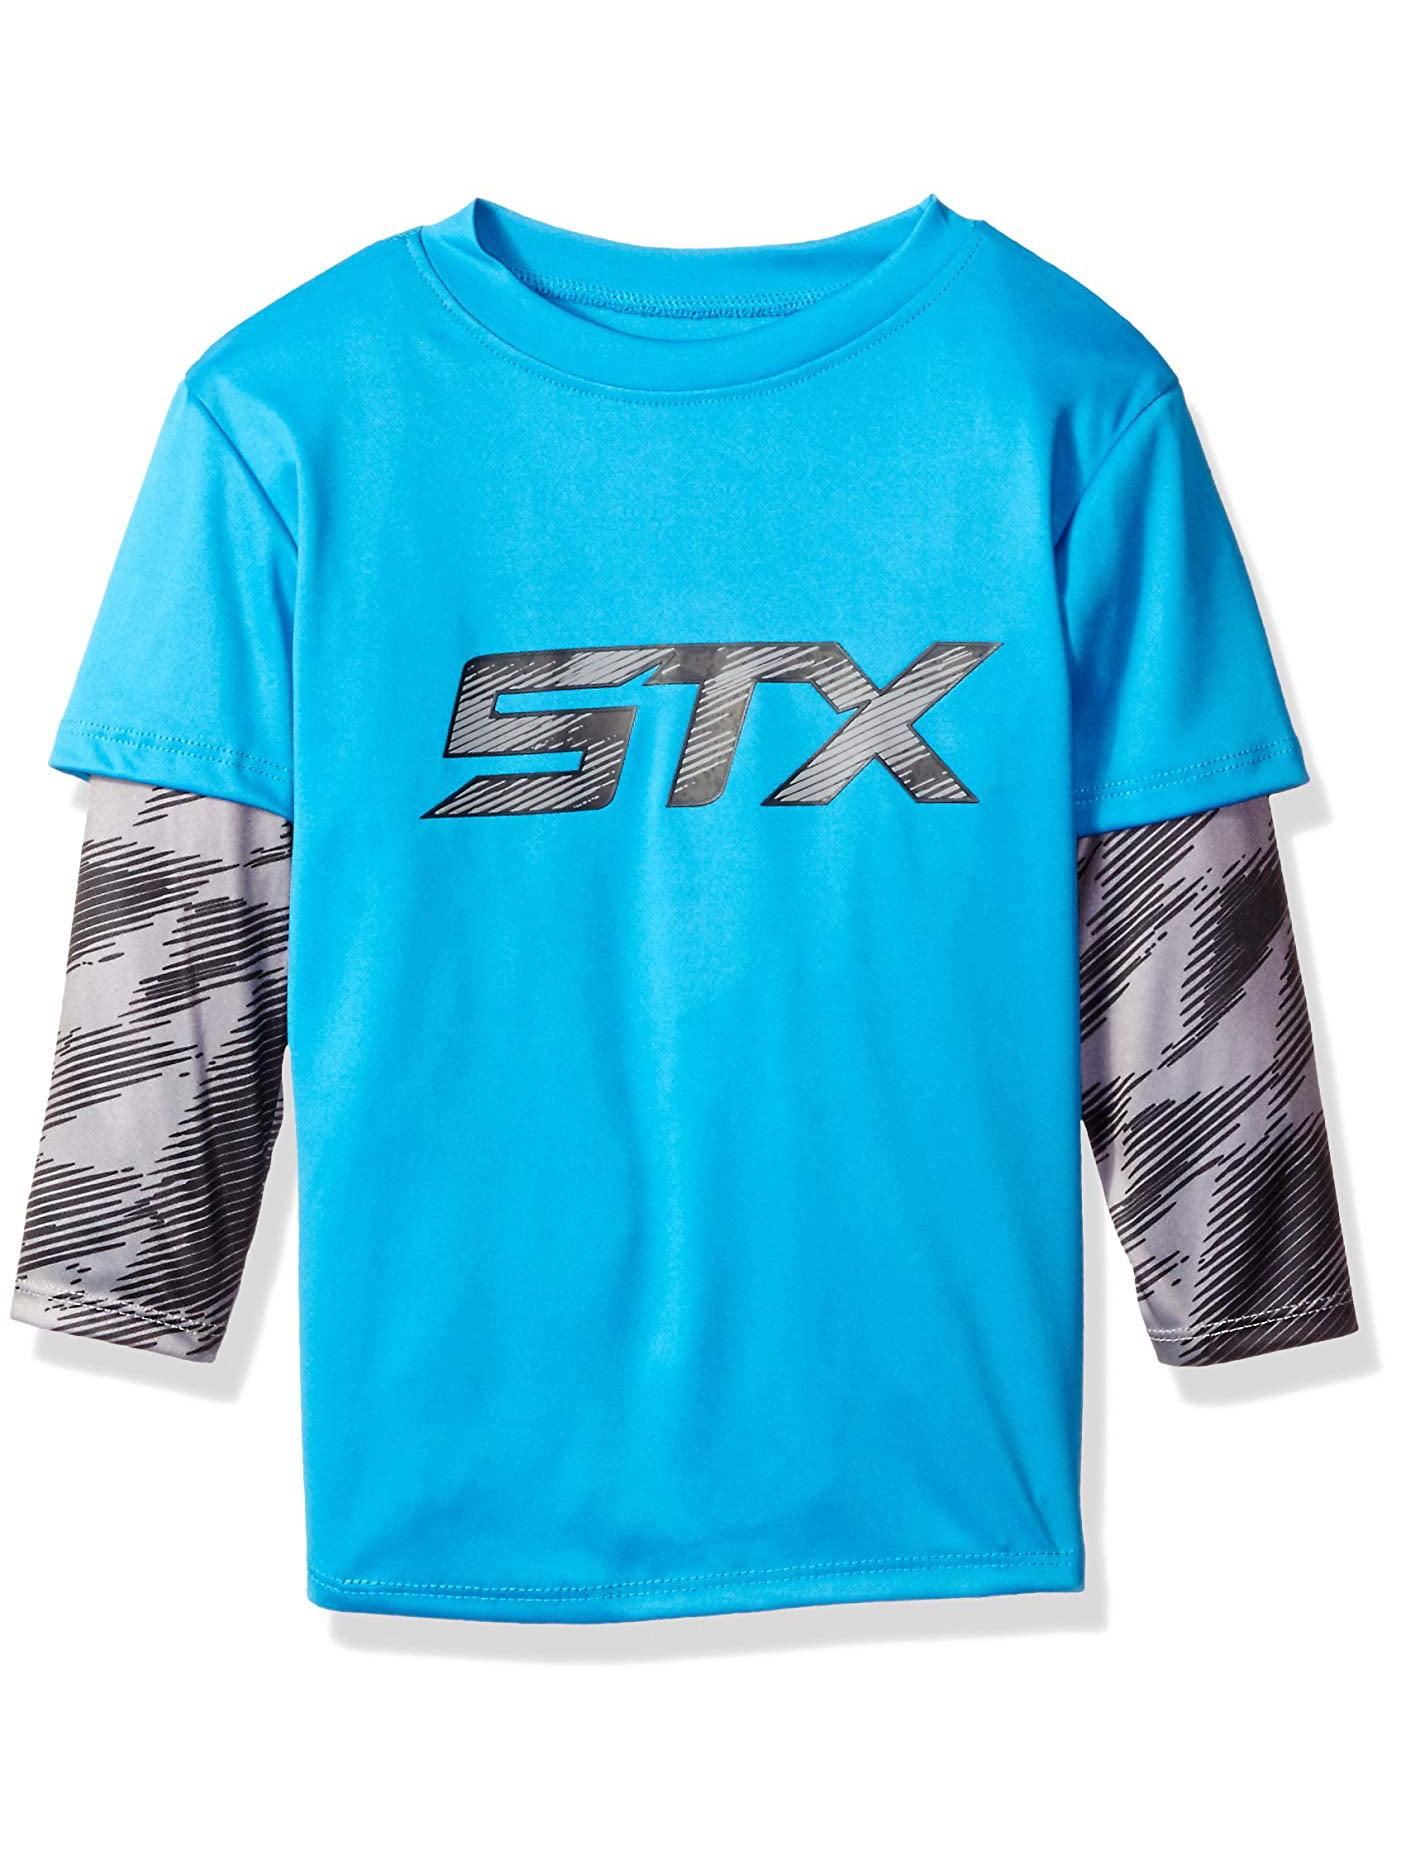 STX Active Performance Long Sleeve Hangdown Tee (Little Boys & Big Boys)